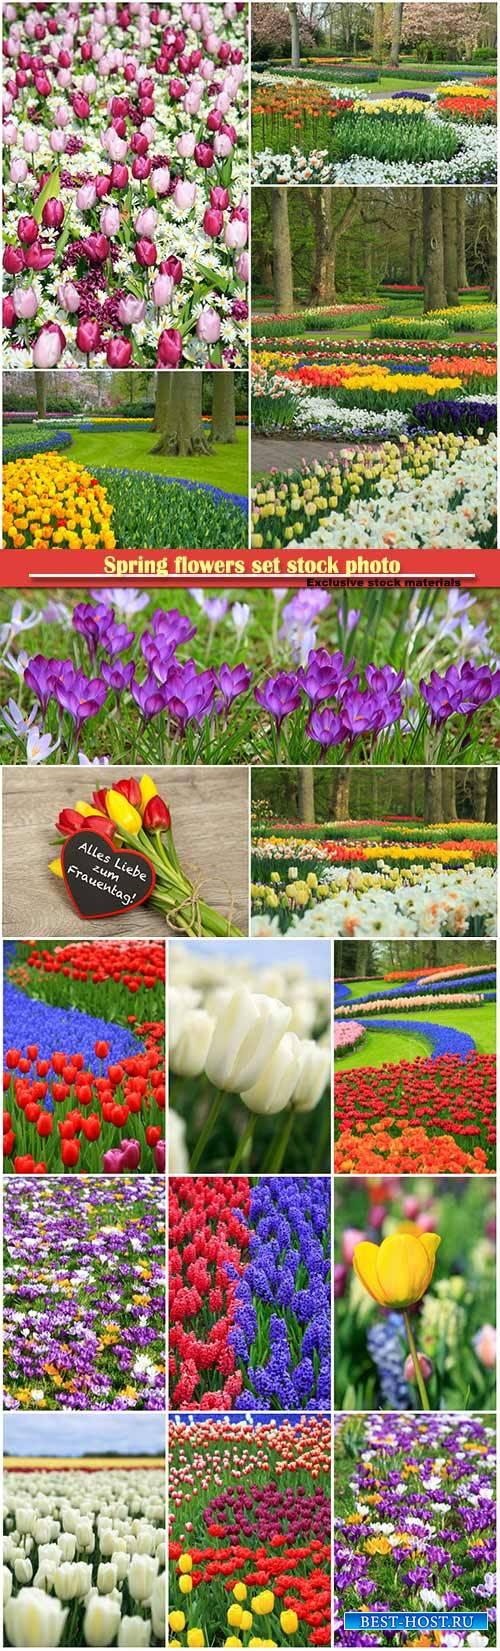 Spring flowers set stock photo